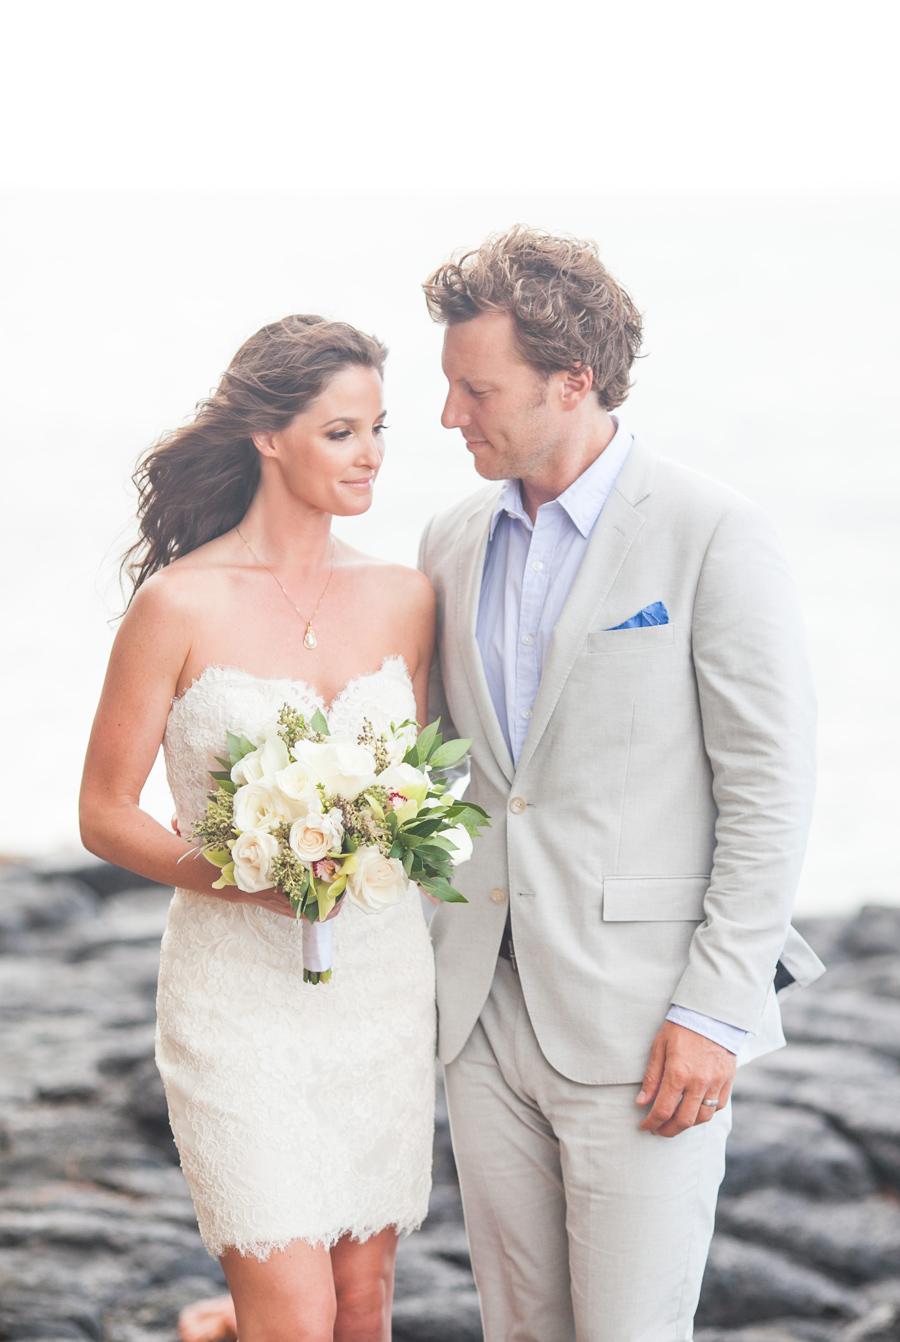 Romantic Kauai Wedding Portraits